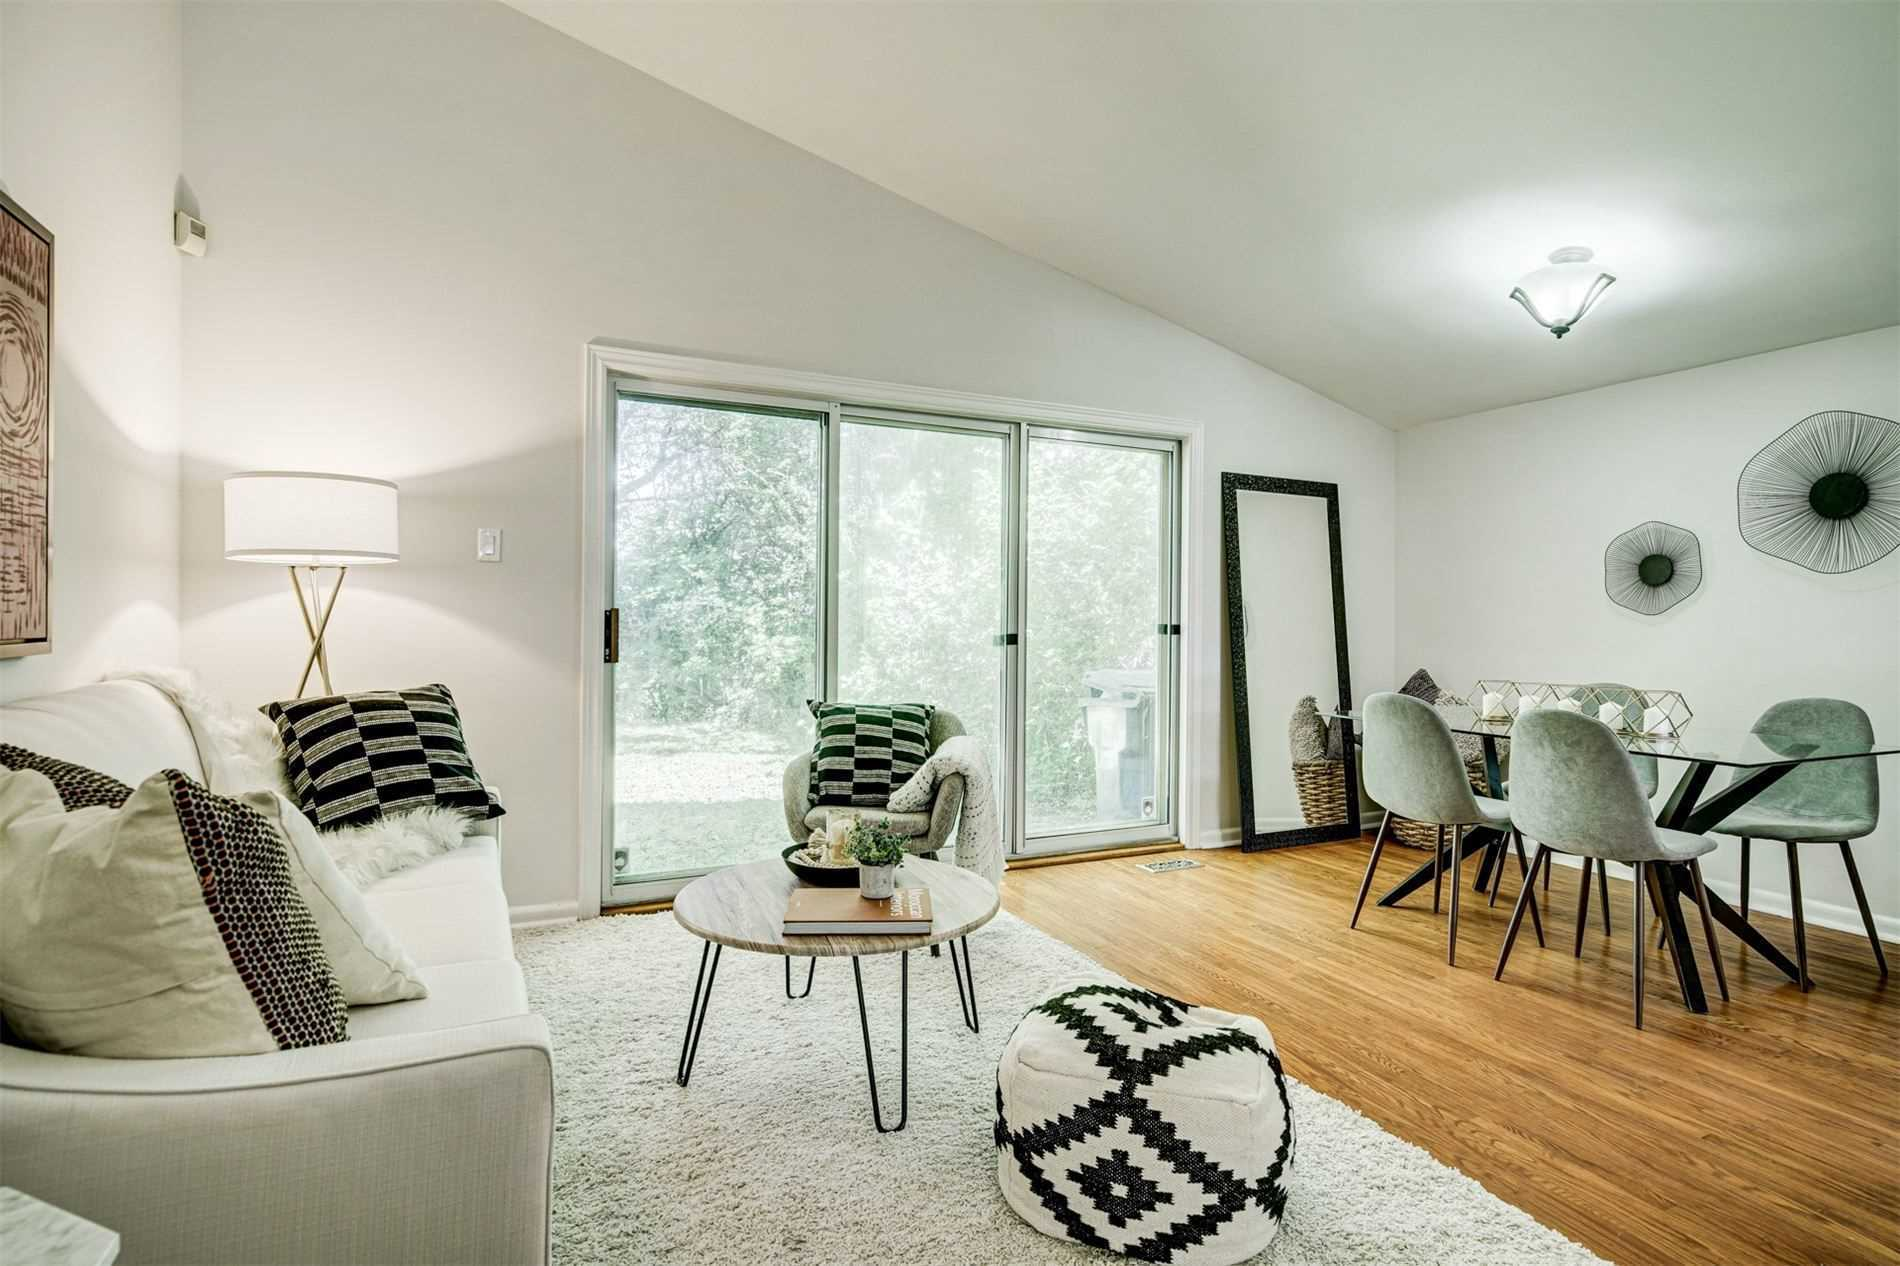 140 Verobeach Blvd - Humbermede Detached for sale, 3 Bedrooms (W5385046) - #7